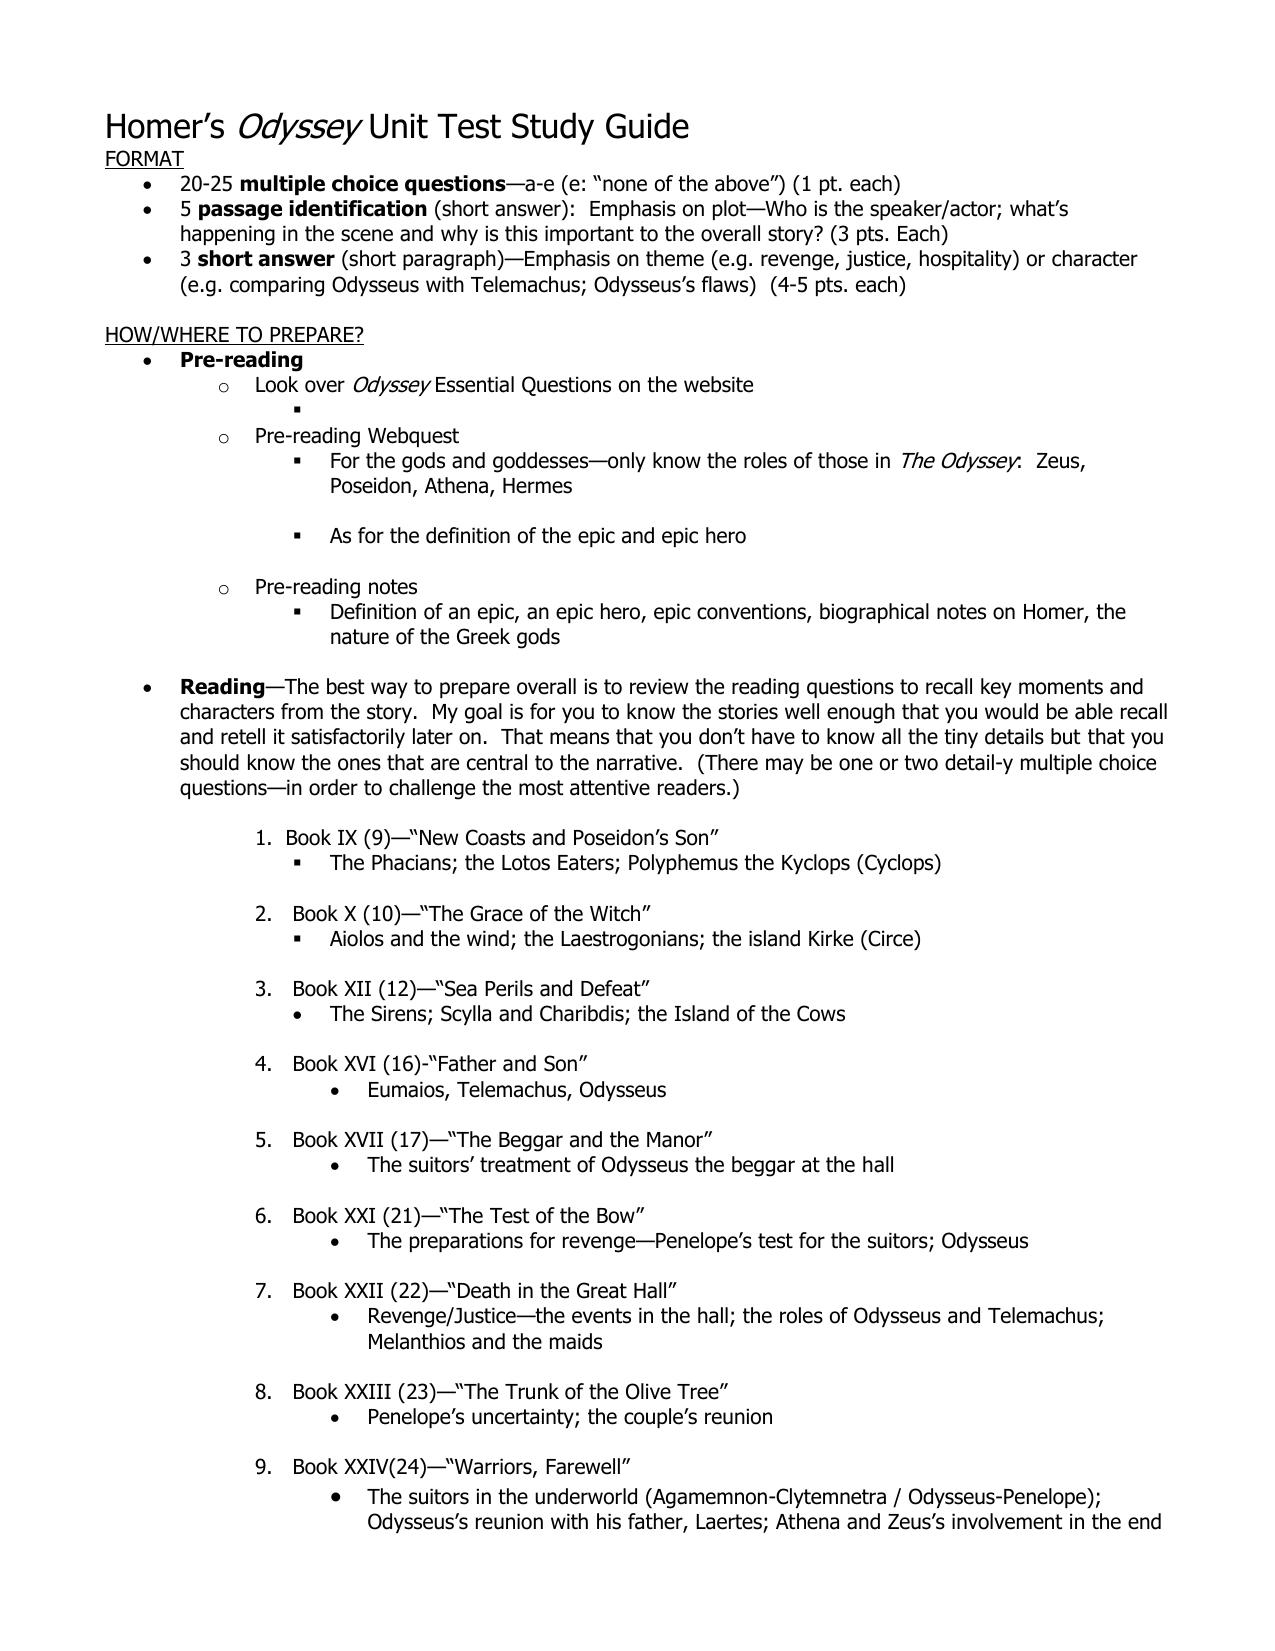 homer s odyssey unit test study guide rh studylib net The Odyssey Character Chart The Odyssey Book